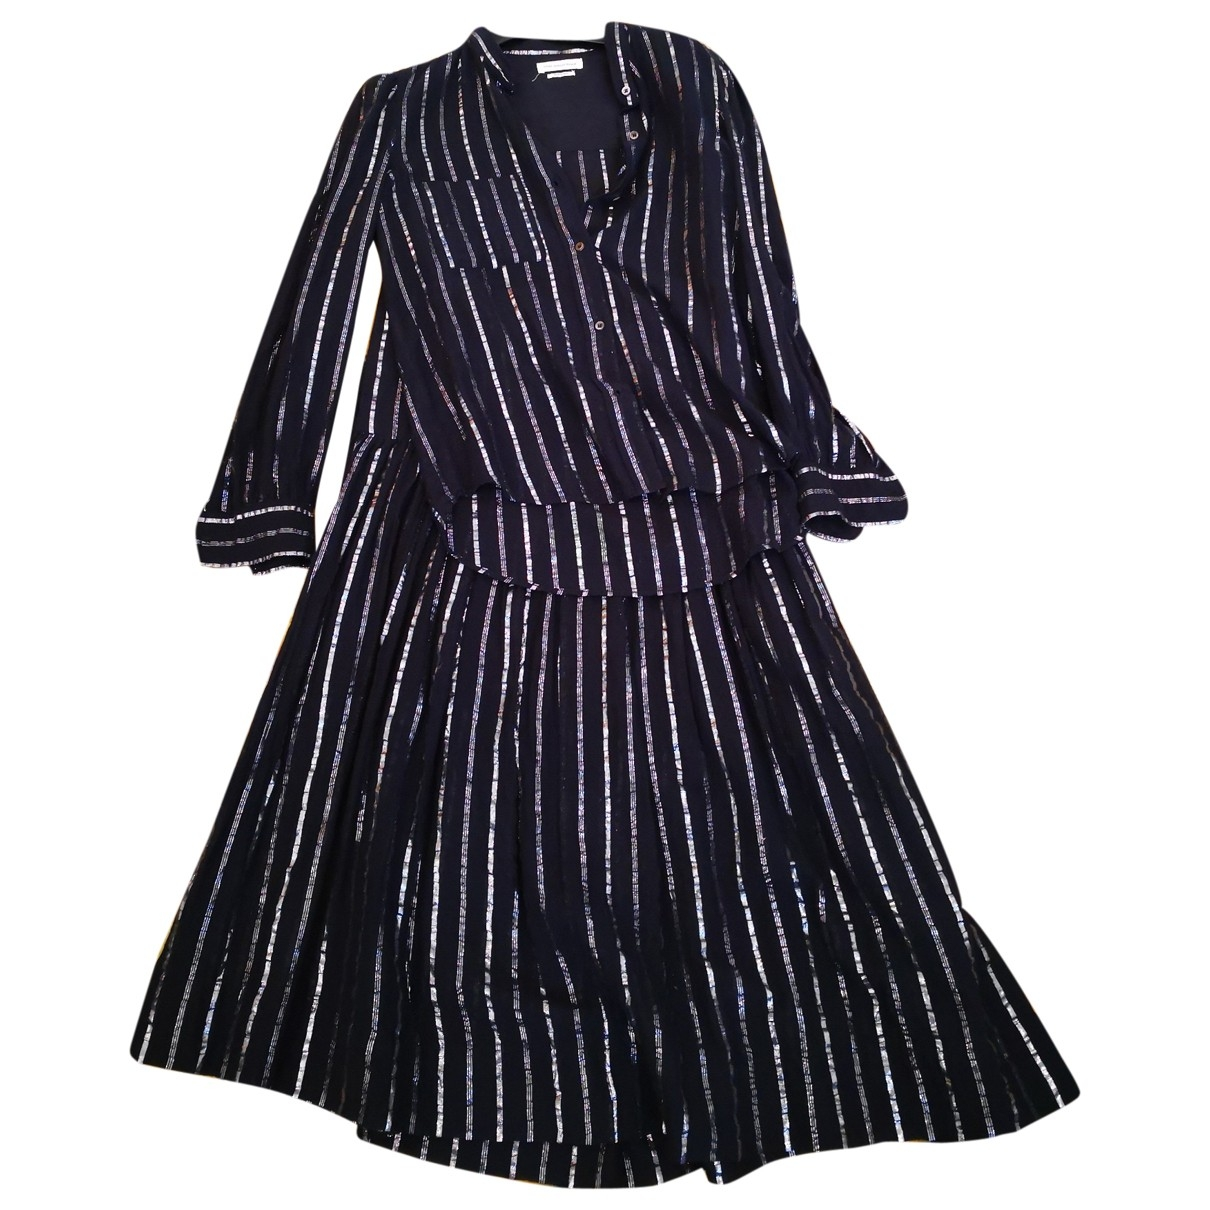 Isabel Marant Etoile \N Kleid in  Schwarz Baumwolle